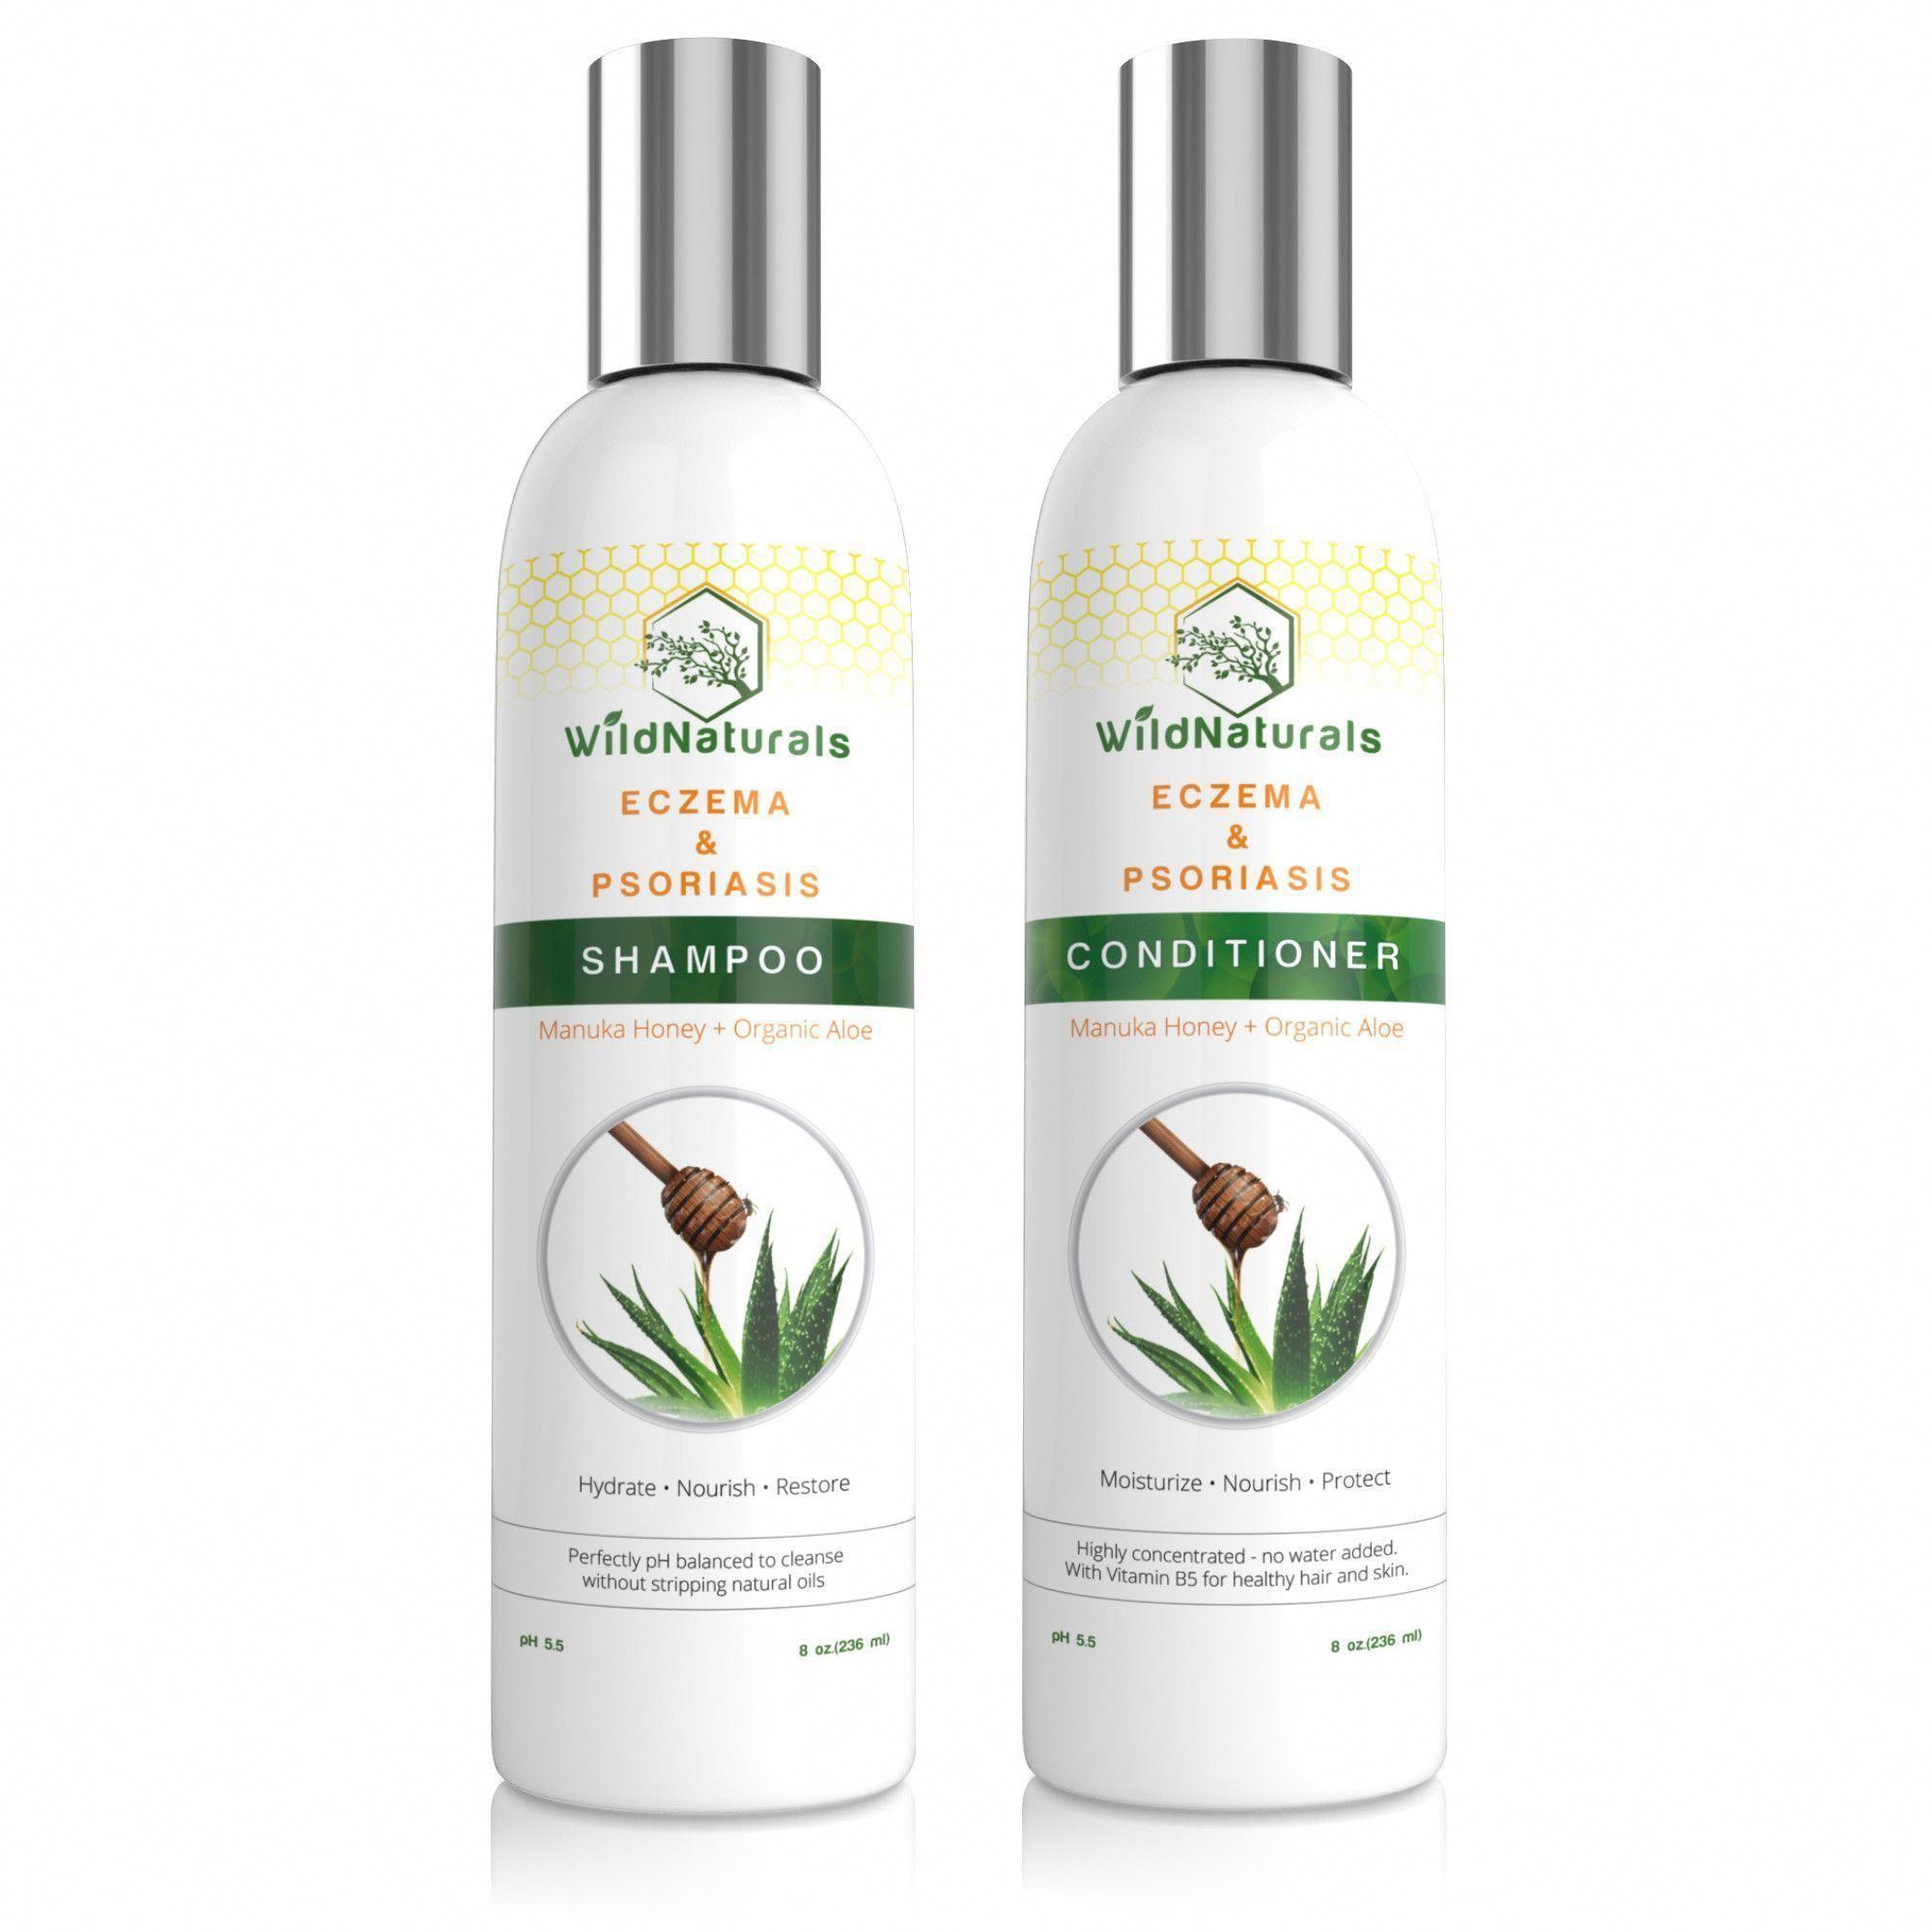 Eczema & Psoriasis Shampoo & Conditioner Set eczemacreams